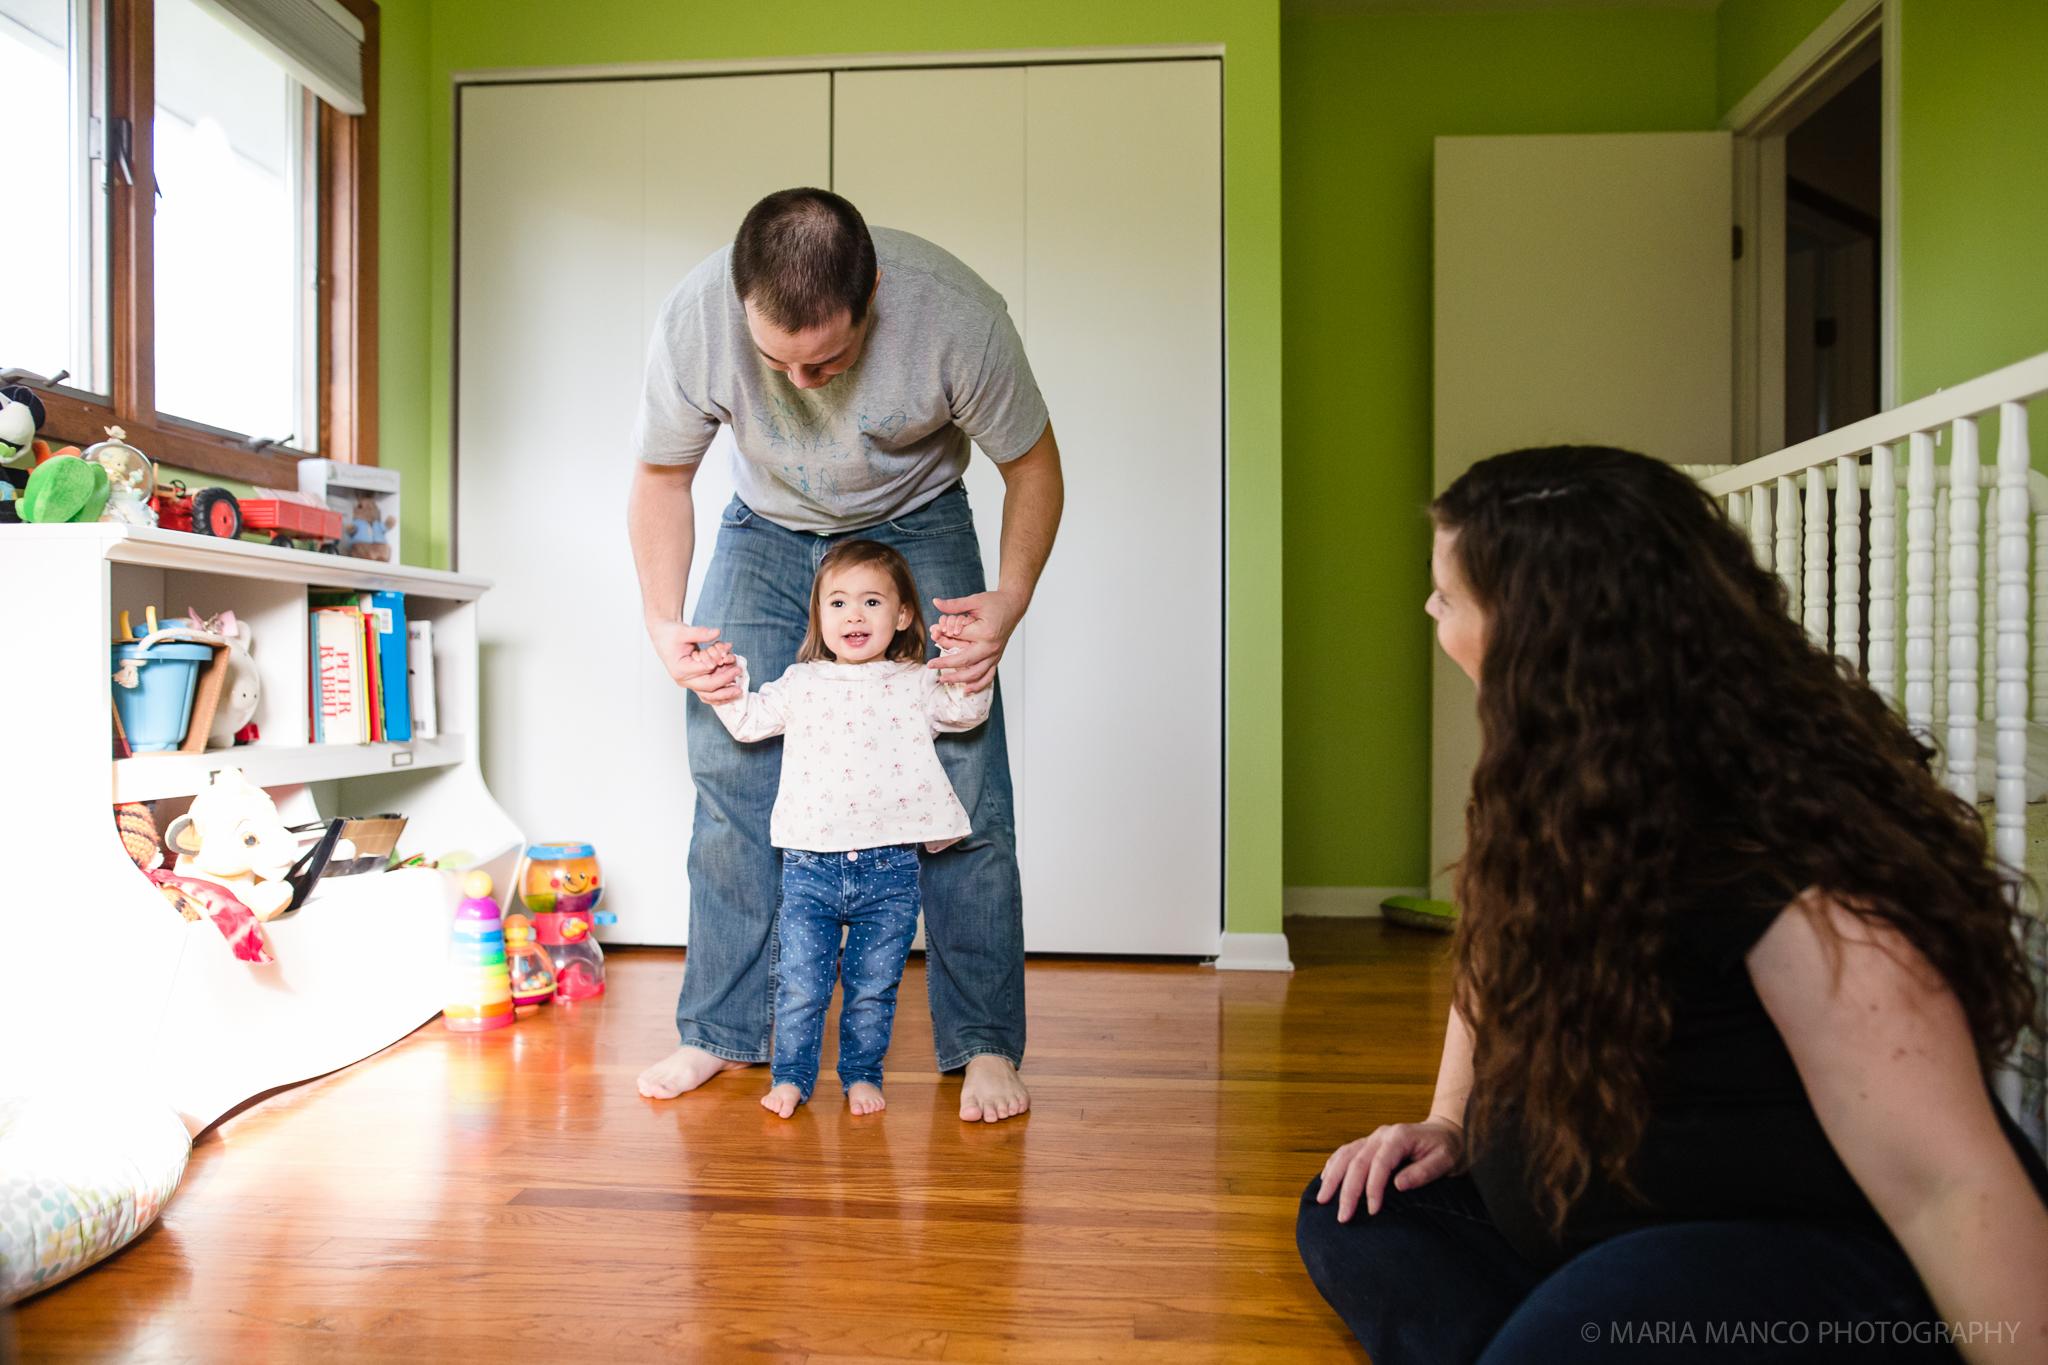 Maria Manco Photography Children and Family Newborn Cleveland Documentary Lifestyle Photographer